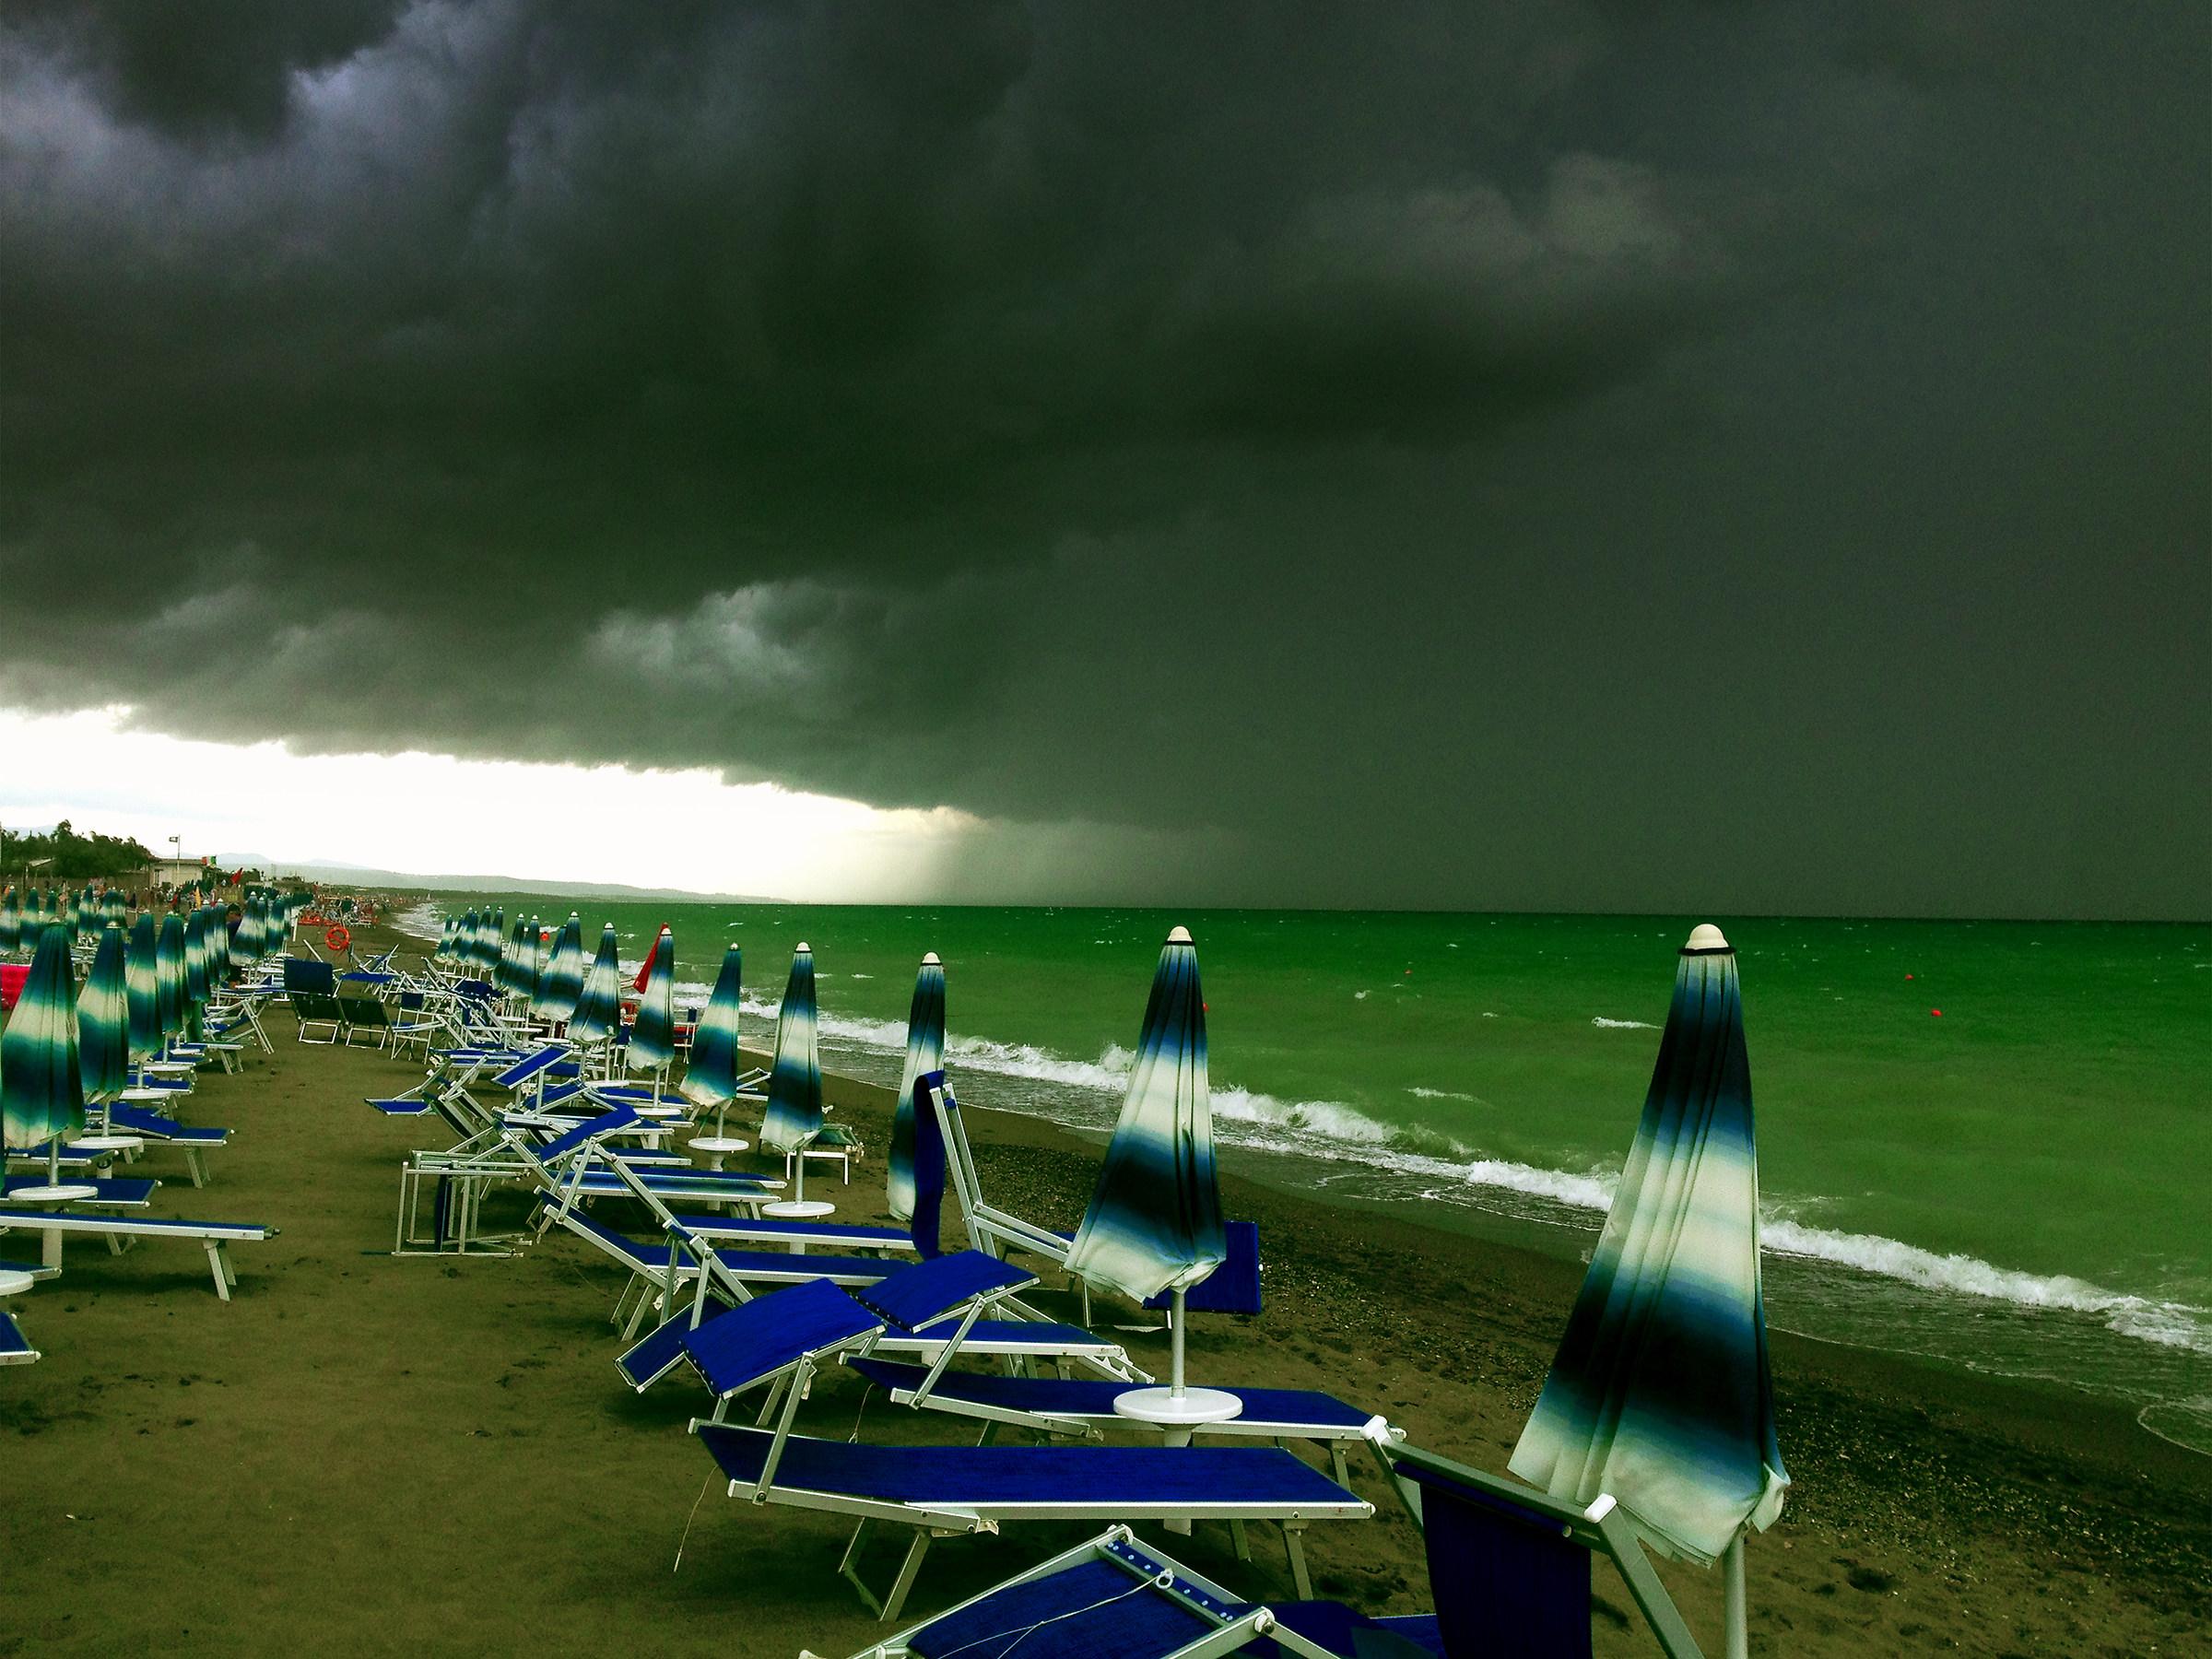 Under a leaden sky...